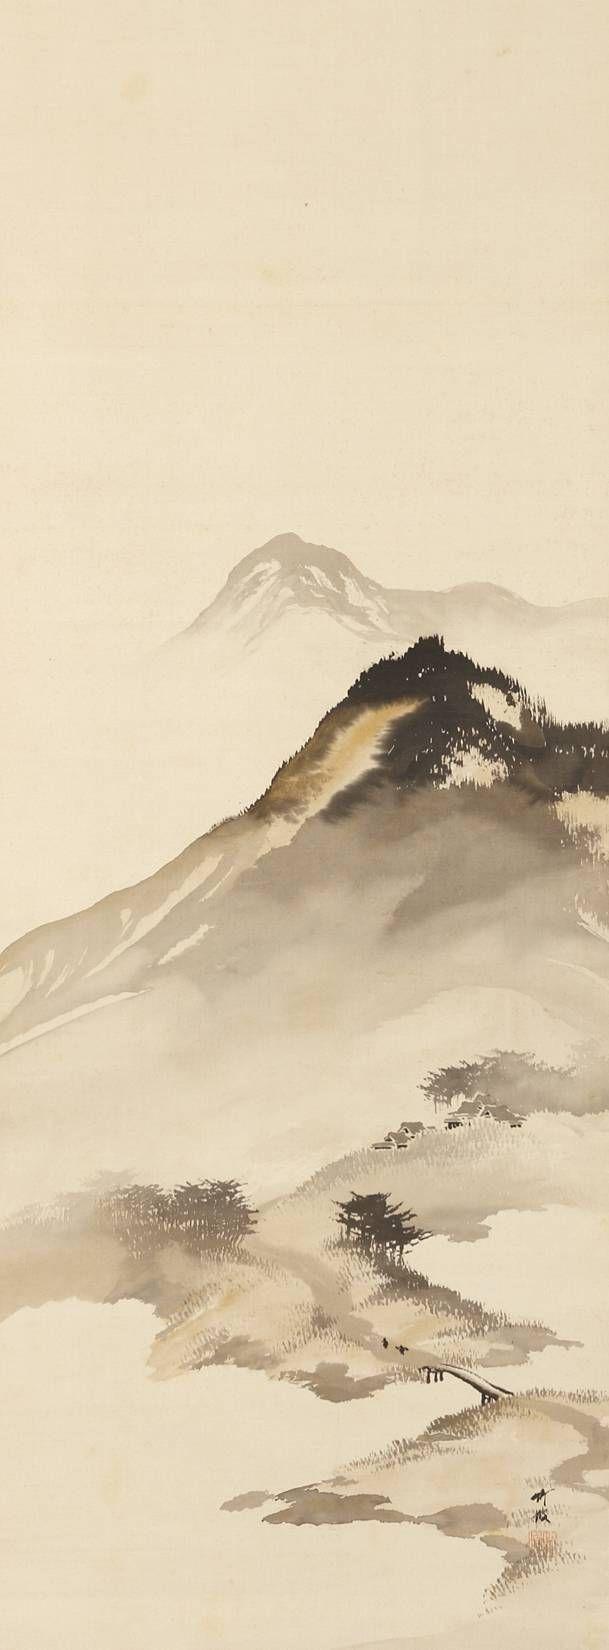 Mountain Landscape with Bridge by Odake Chikuha, 1878-1936 尾竹竹坡 Japan  chinese landscape